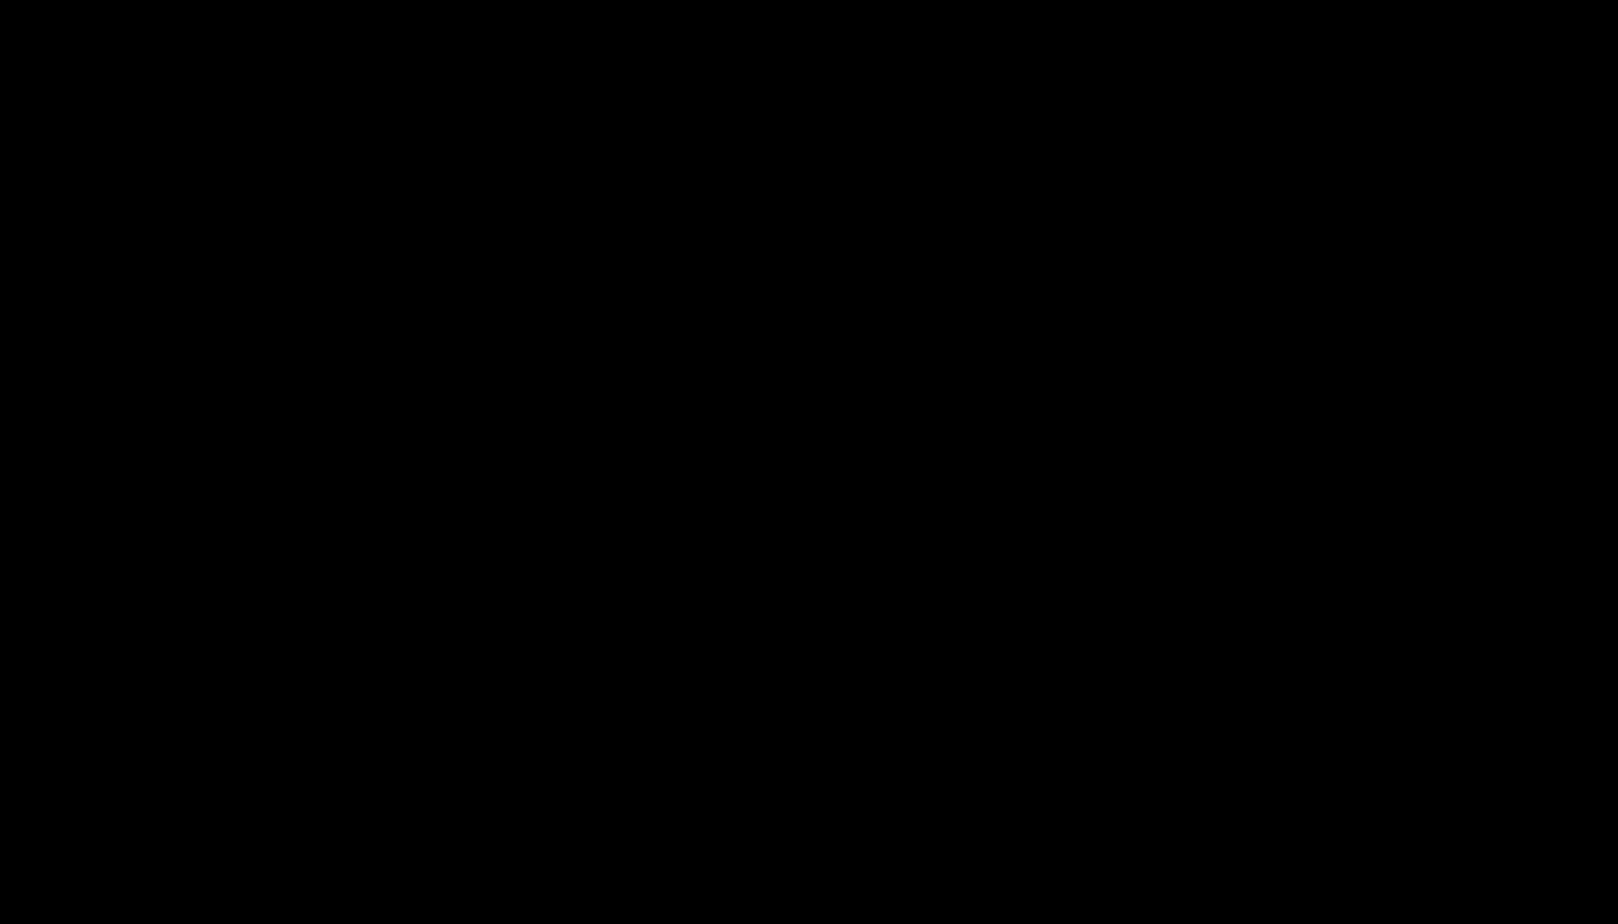 Biotin-dPEG®₁₁-Lipoamide